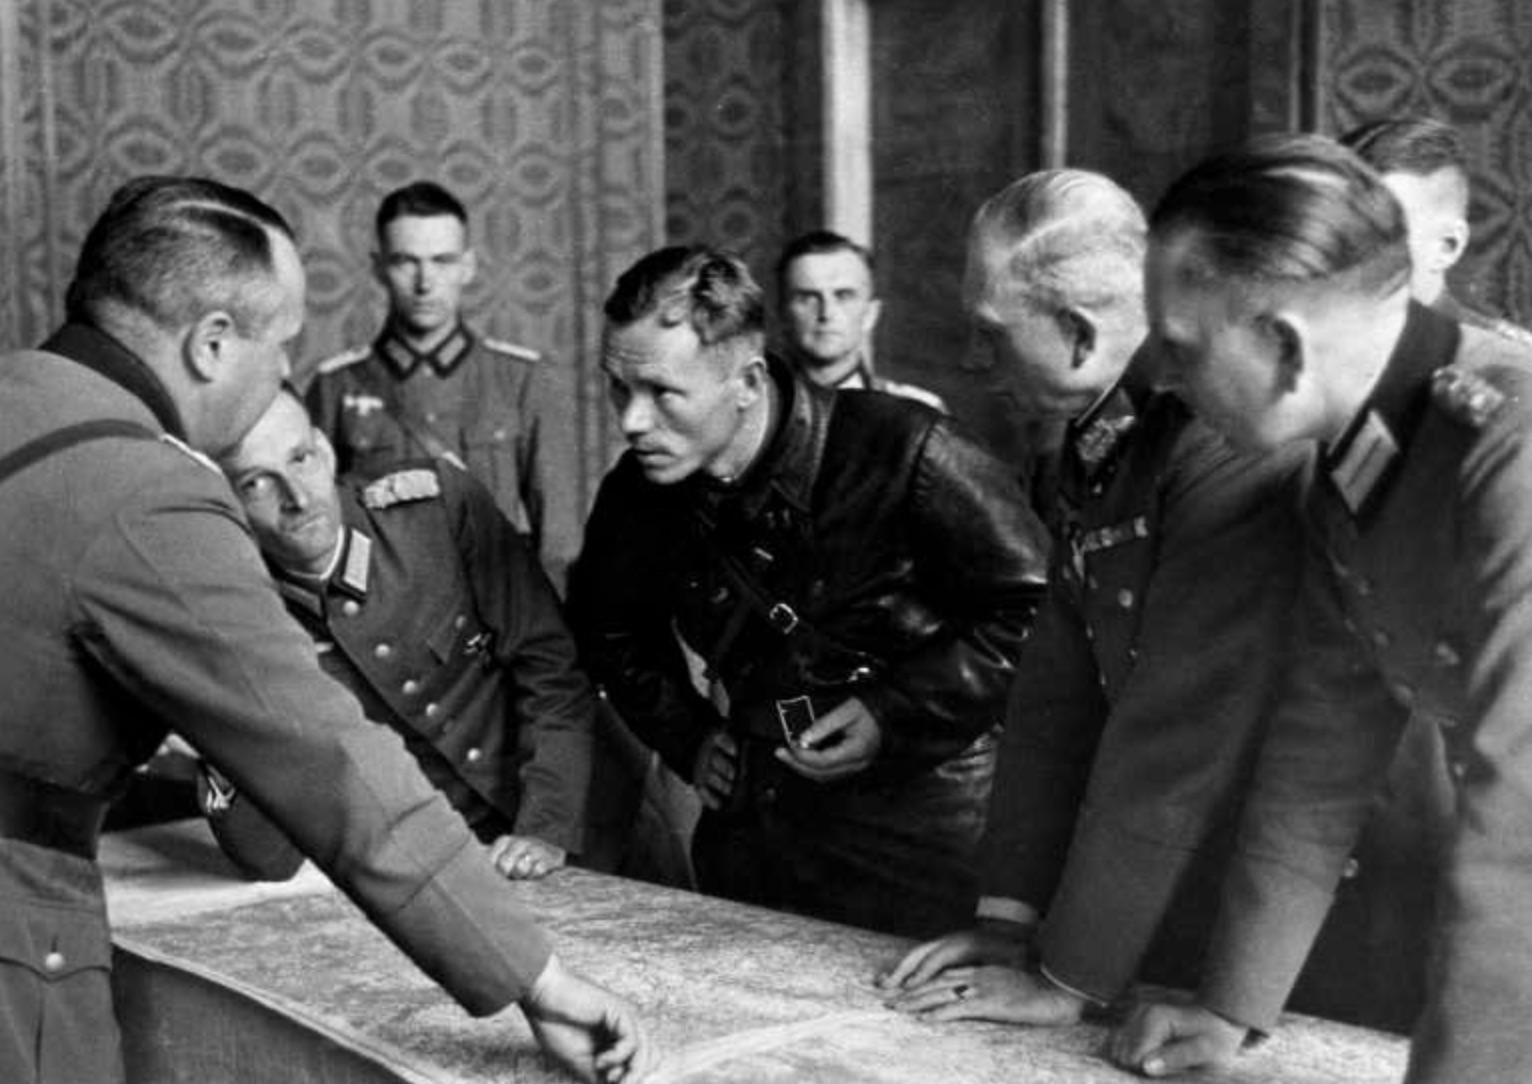 nazis_sovieticos_polonia.jpg